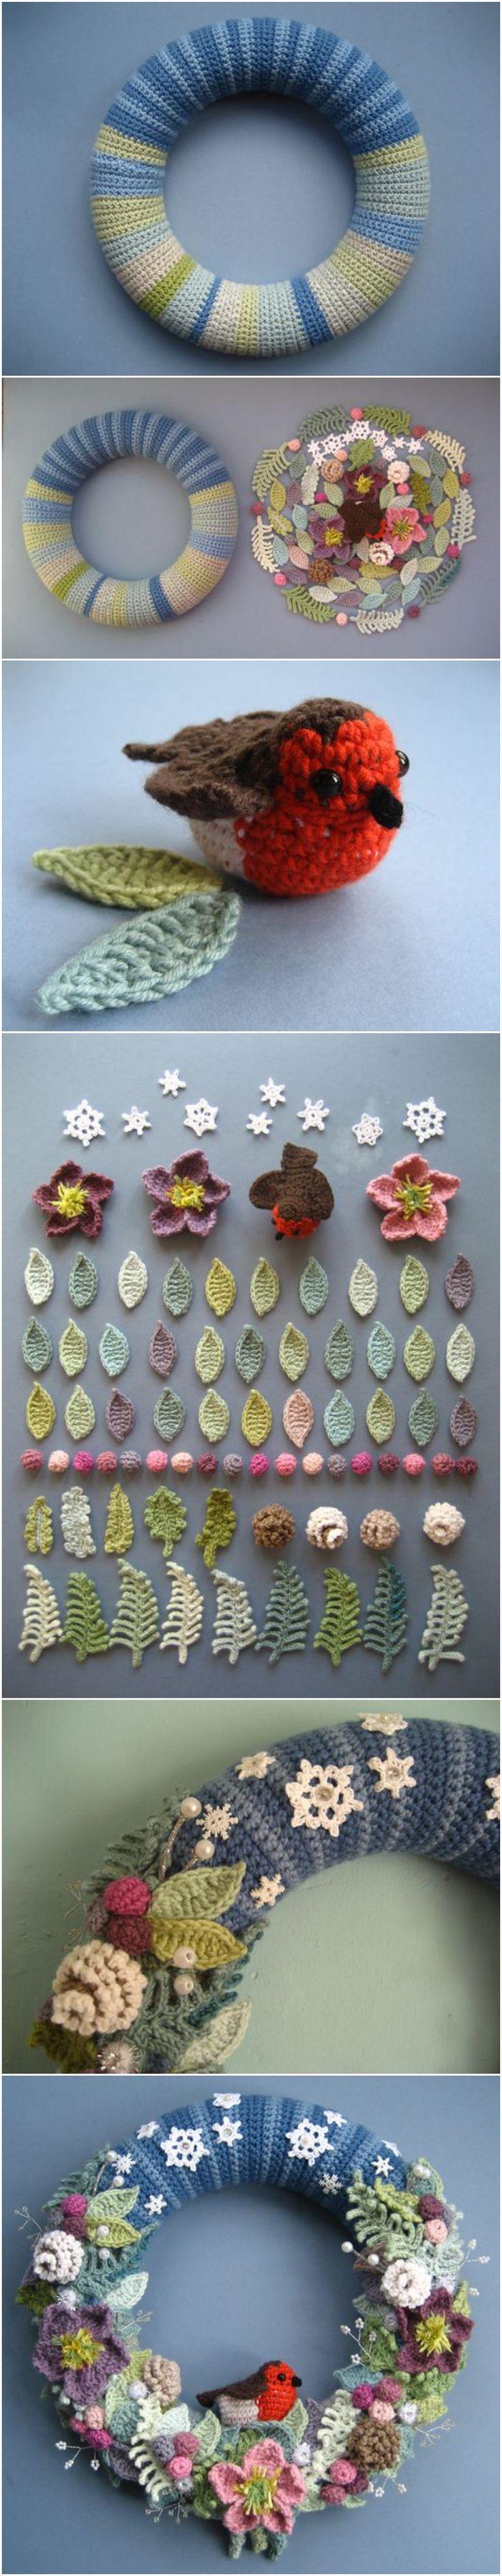 Crochet Beautiful Wreath with Free Pattern